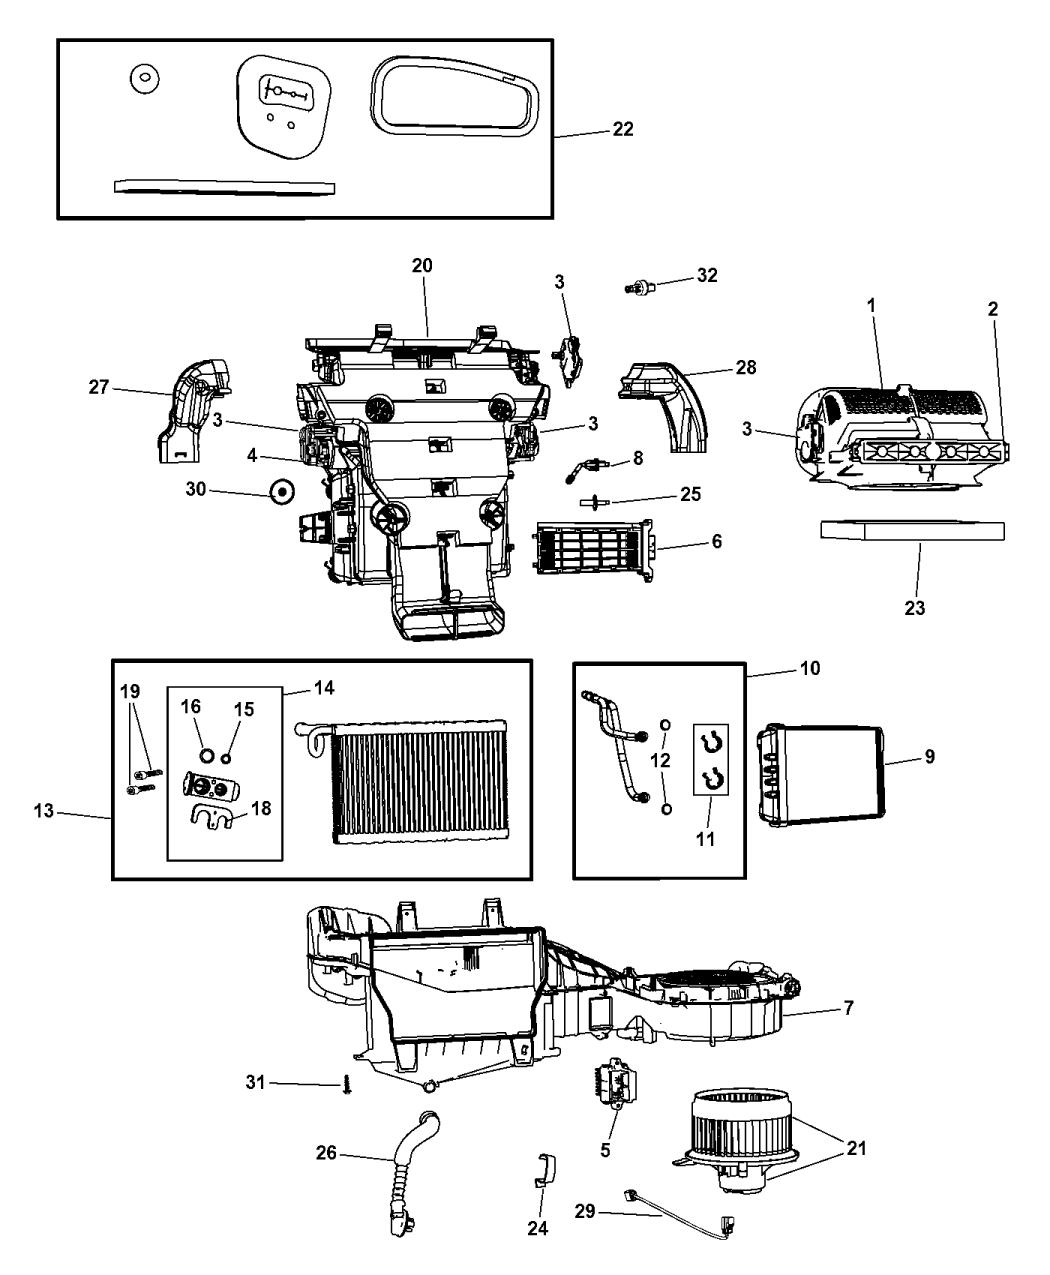 68079489AB - Genuine Jeep DOOR-FILTER ACCESS